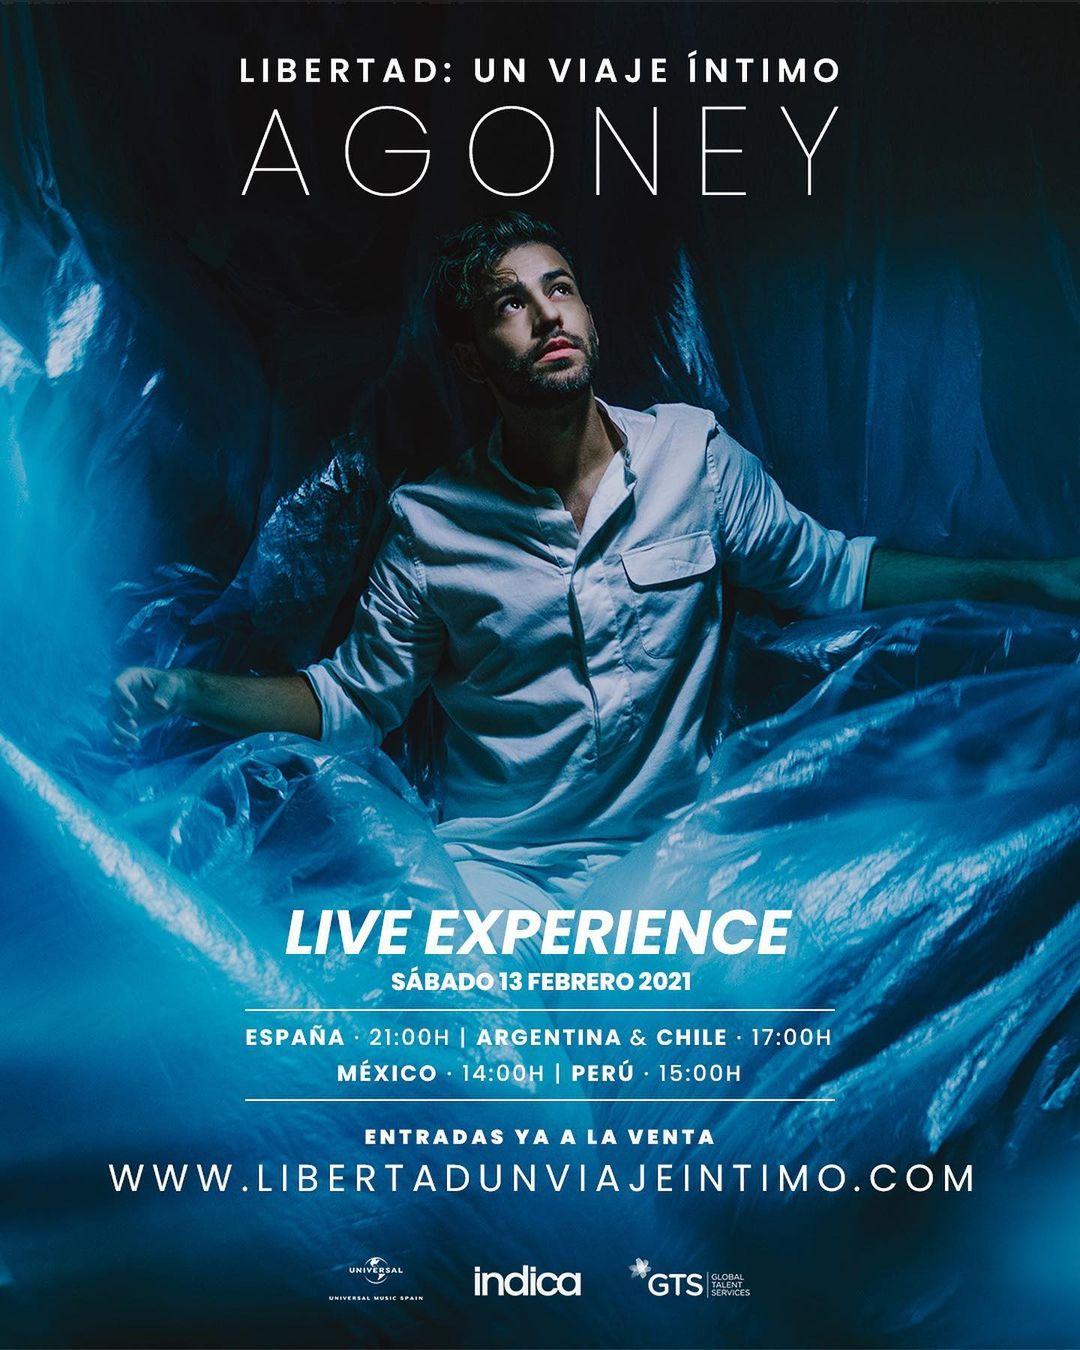 Agoney Libertad Live Experience